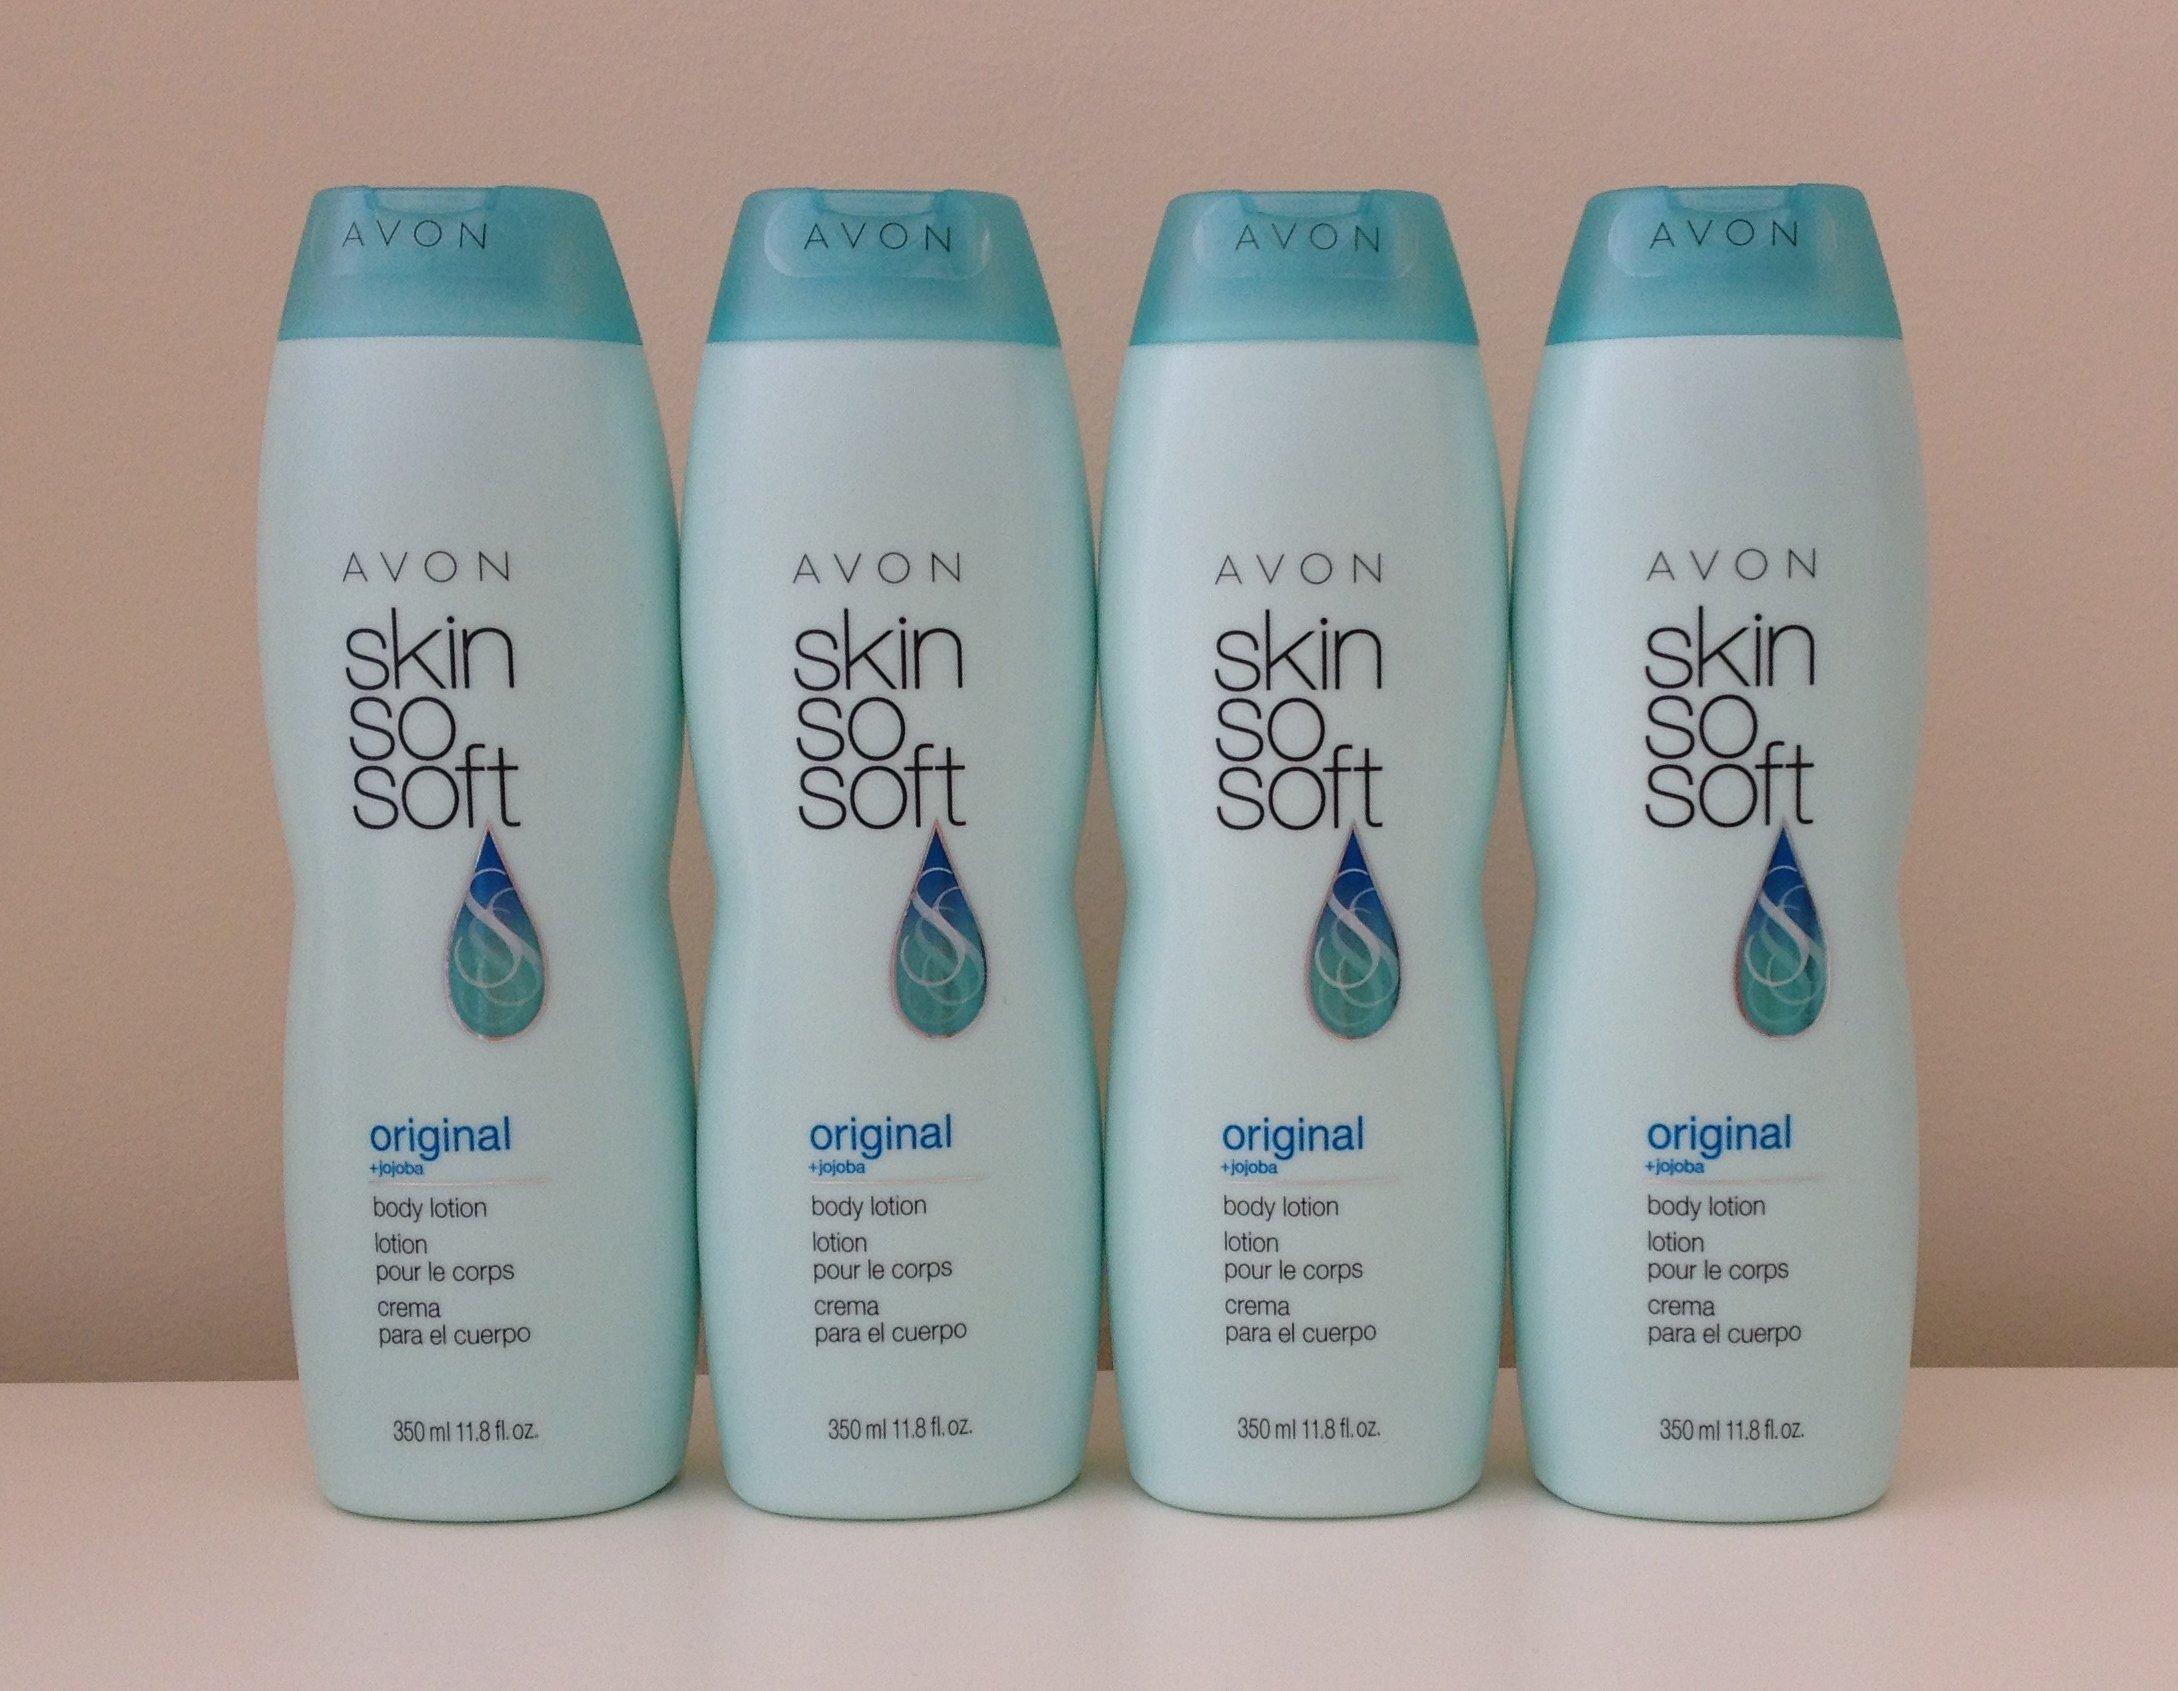 Lot of 4 Avon Skin So Soft Original Body Lotion 11.8 oz. Each. by Skin so soft